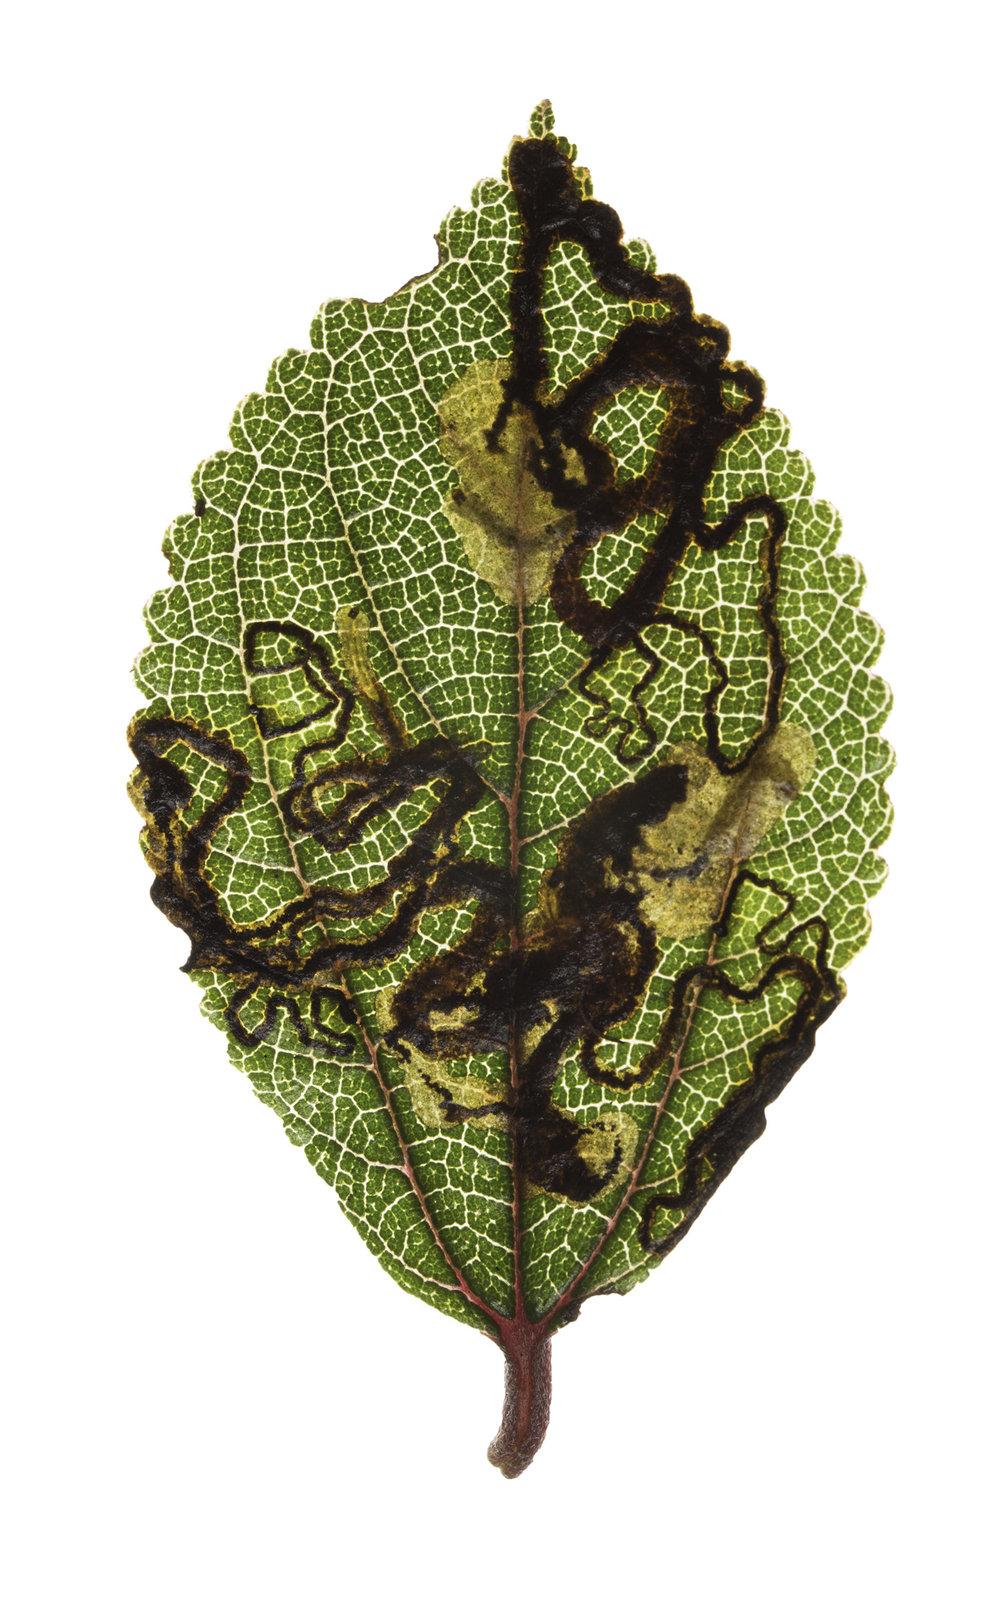 caterpillars in mamaki leaf